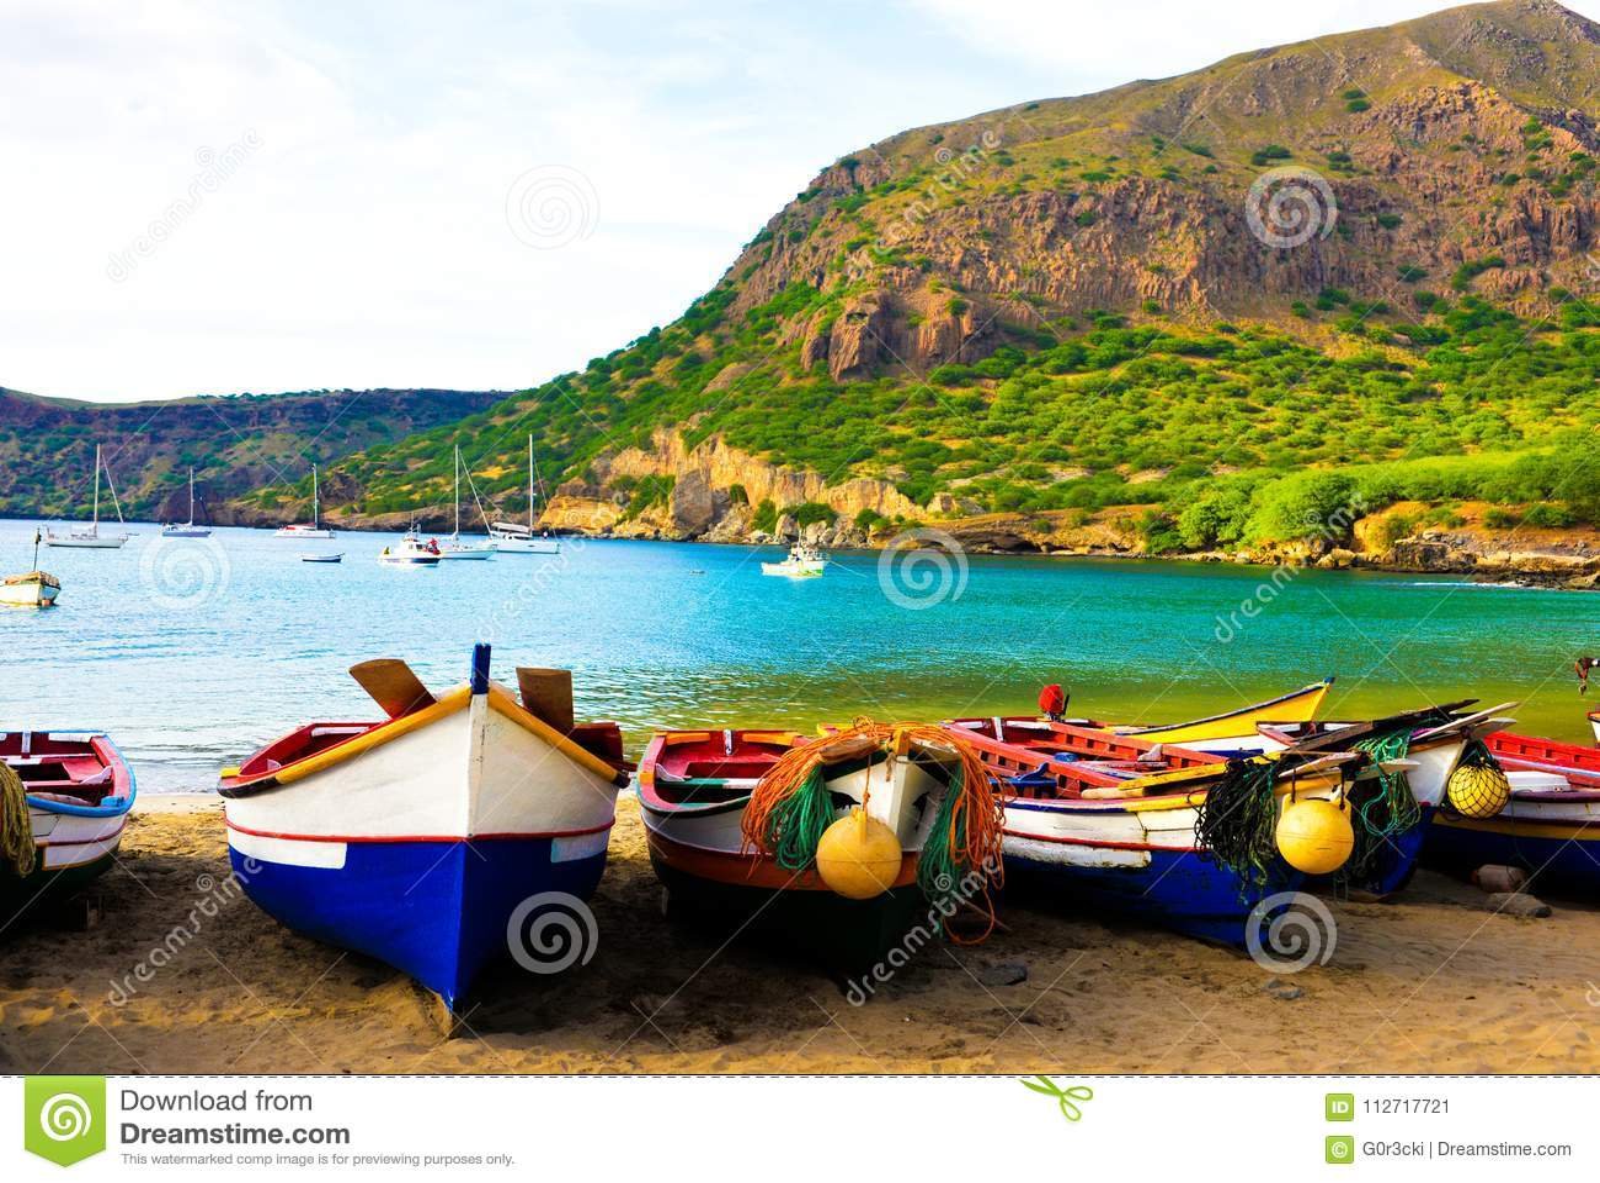 Praia da angra de Cabo Verde, Santiago Island, barcos de pesca coloridos em Tarrafal